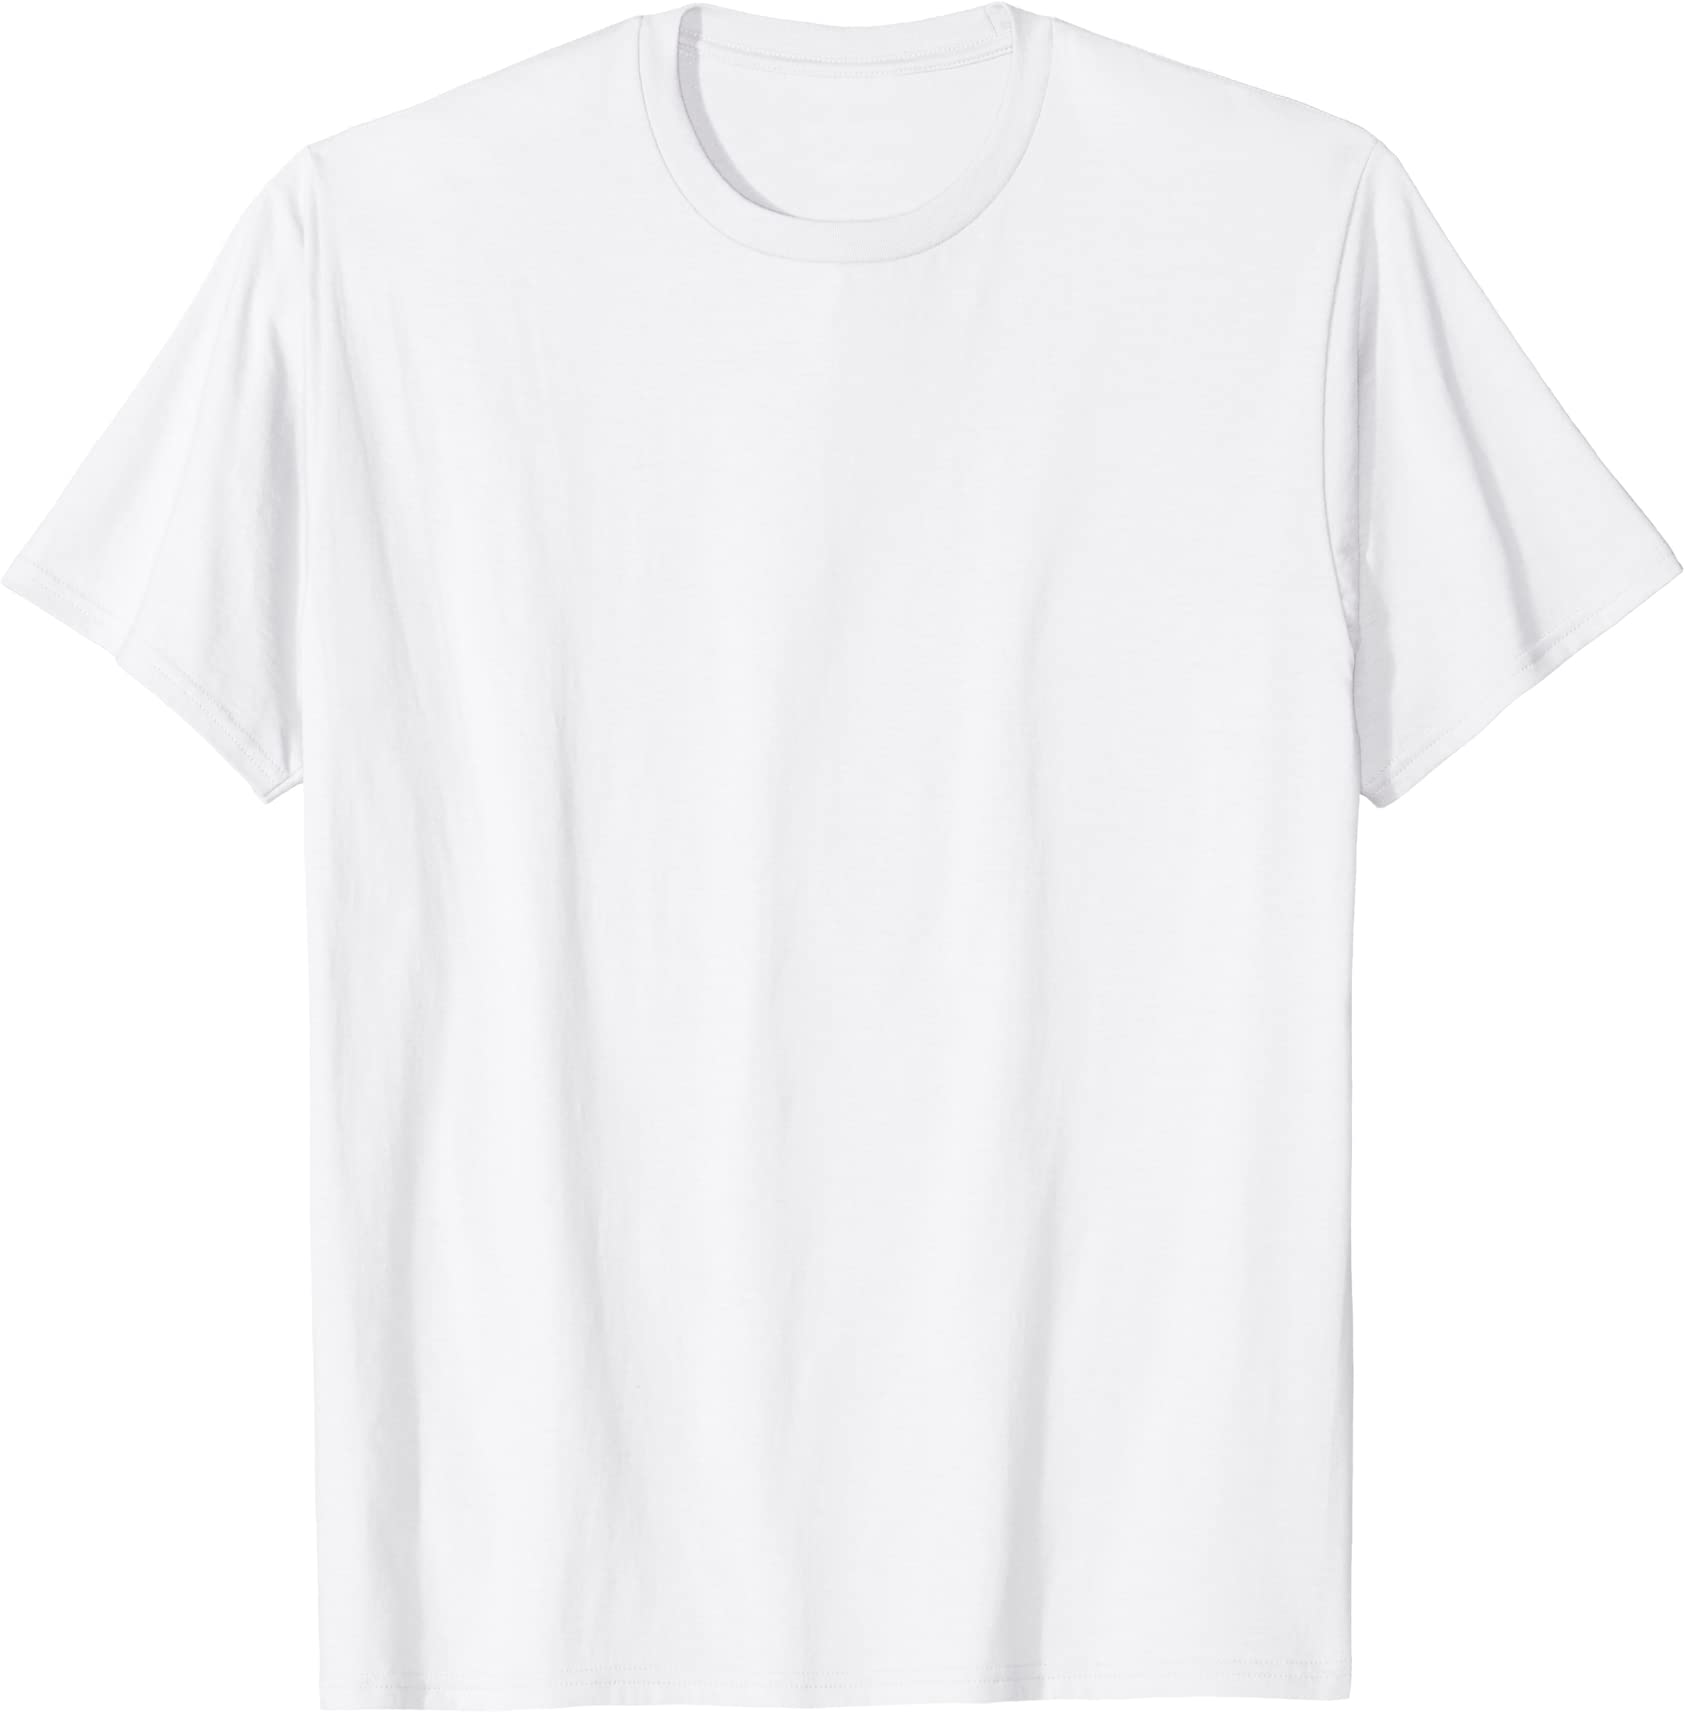 Mens Rlt Ride Slow Graphic T-Shirt Ecko Unltd